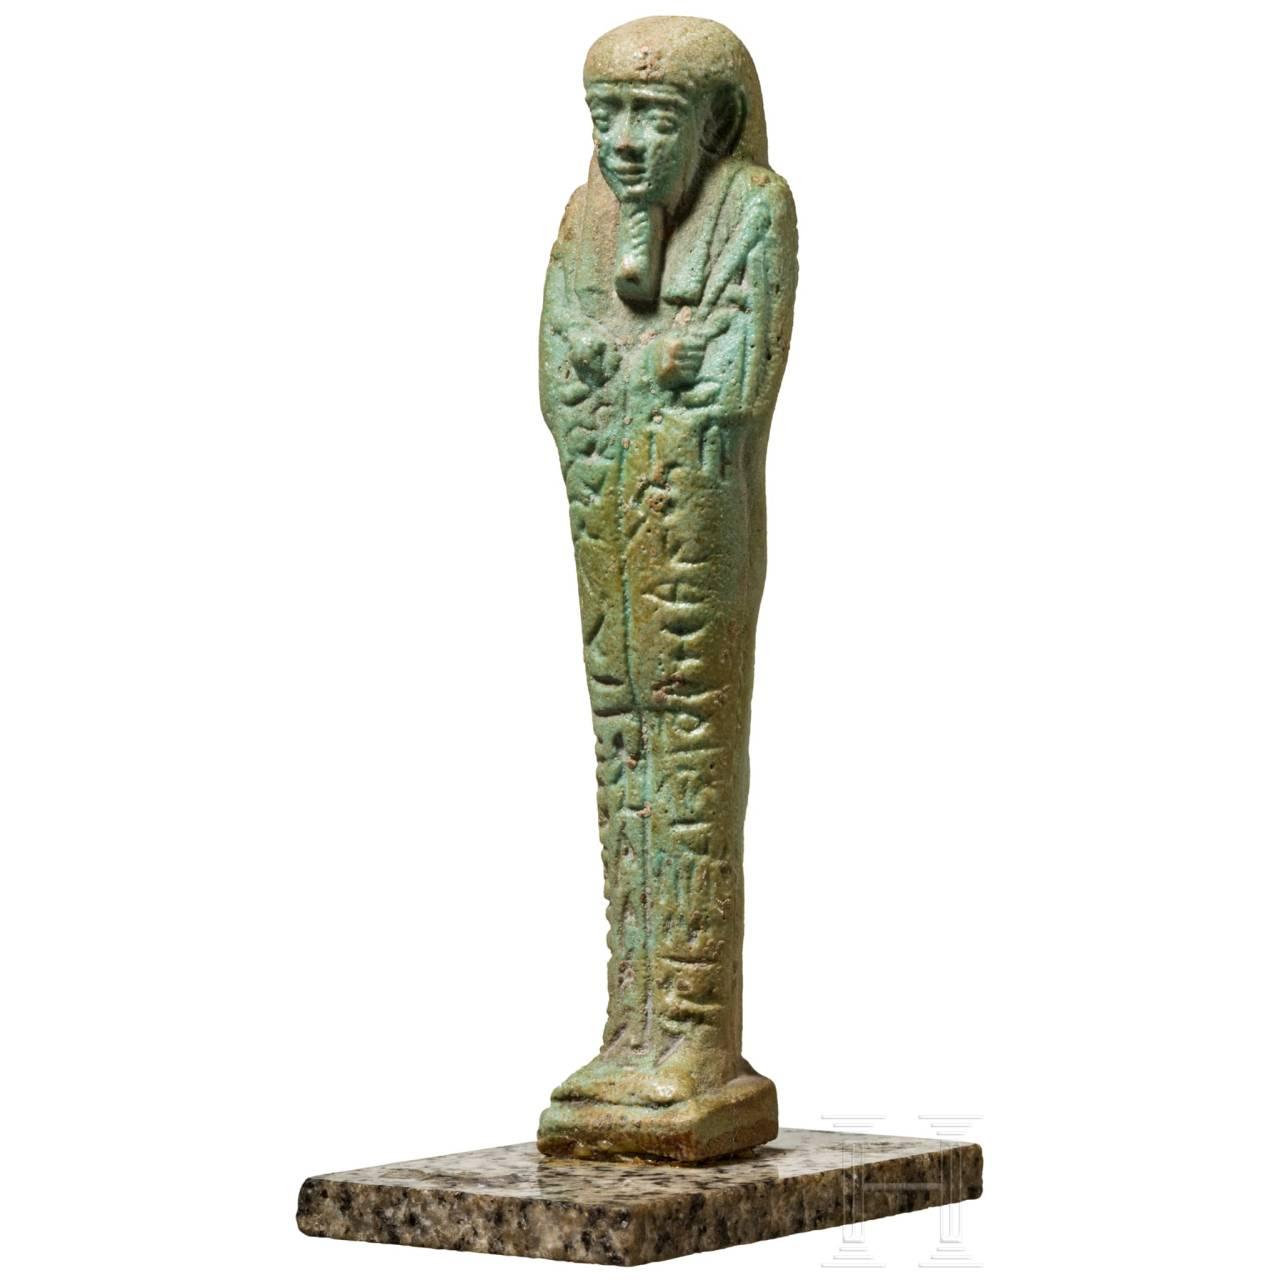 An Egyptian Ushabti of Hor-Khonsou, circa 500 B.C.